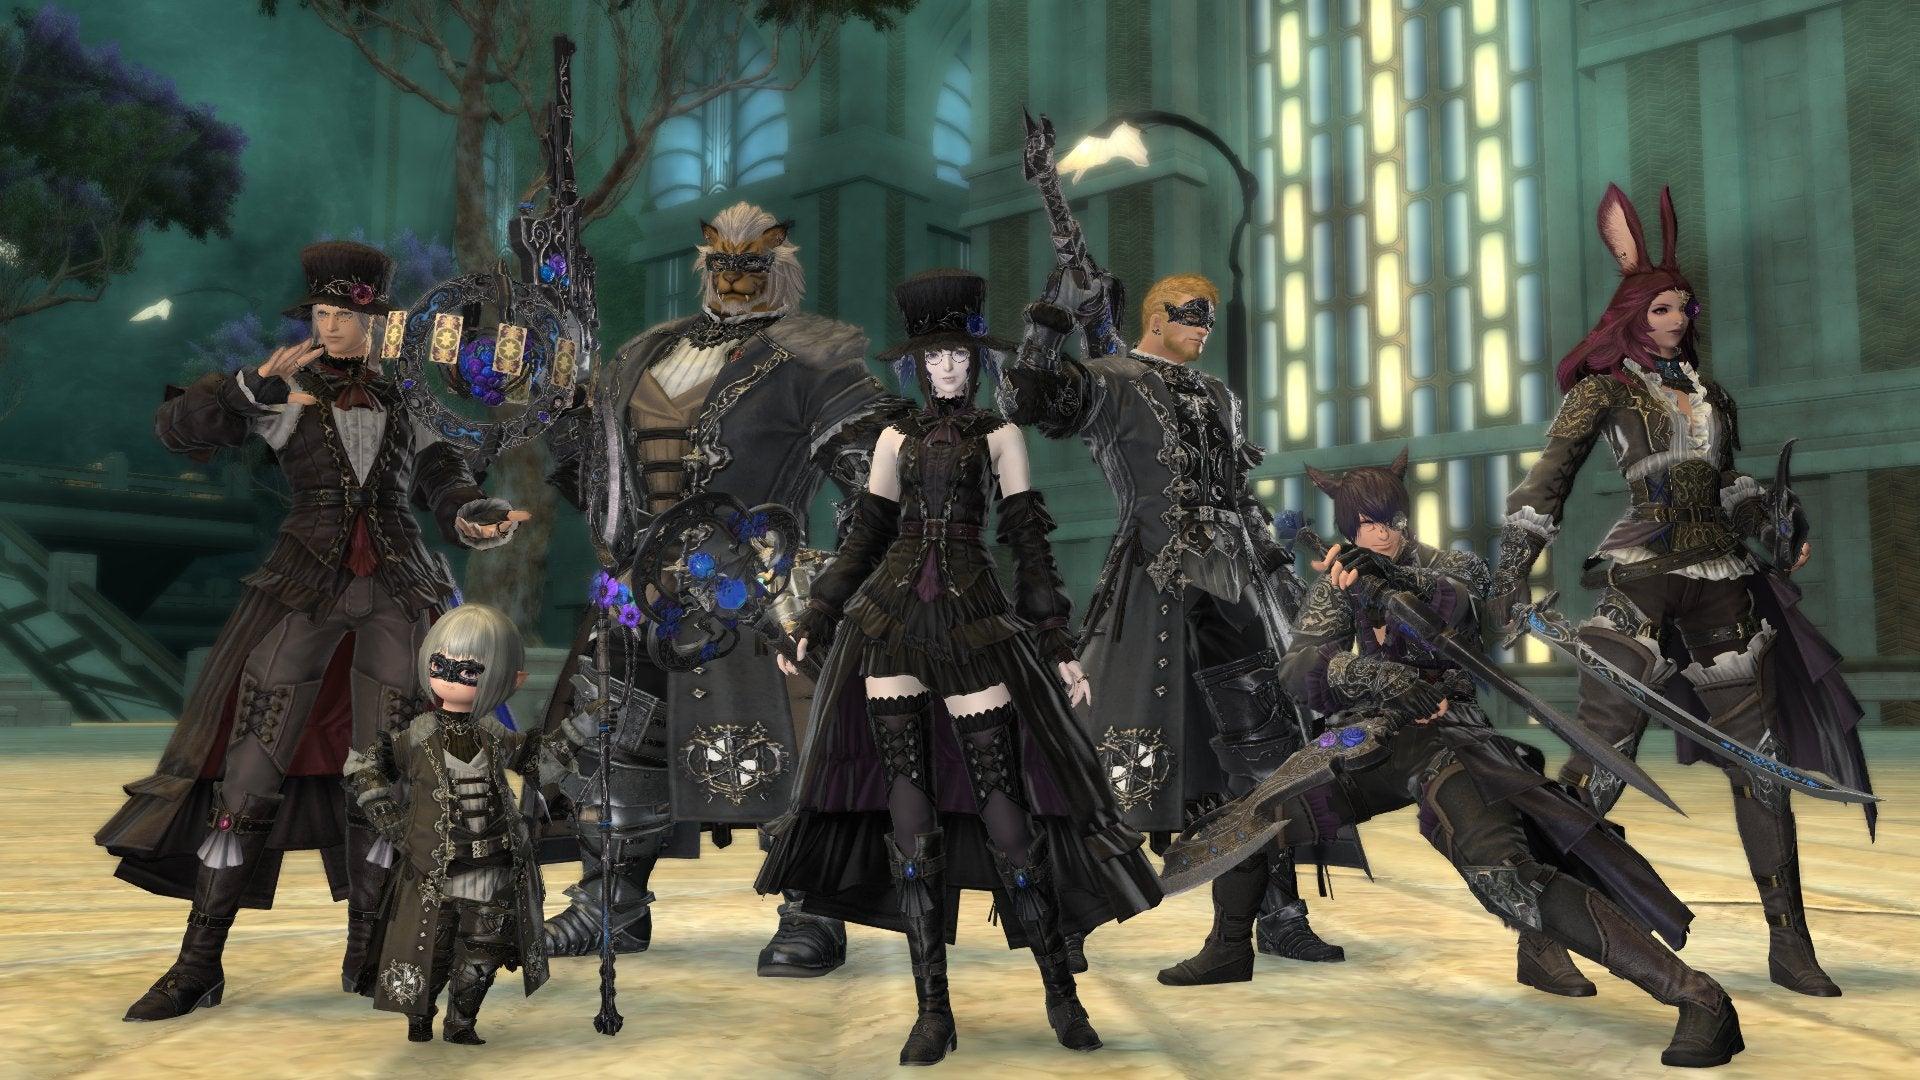 Image for Final Fantasy 14's next big update, Futures Rewritten, drops December 8